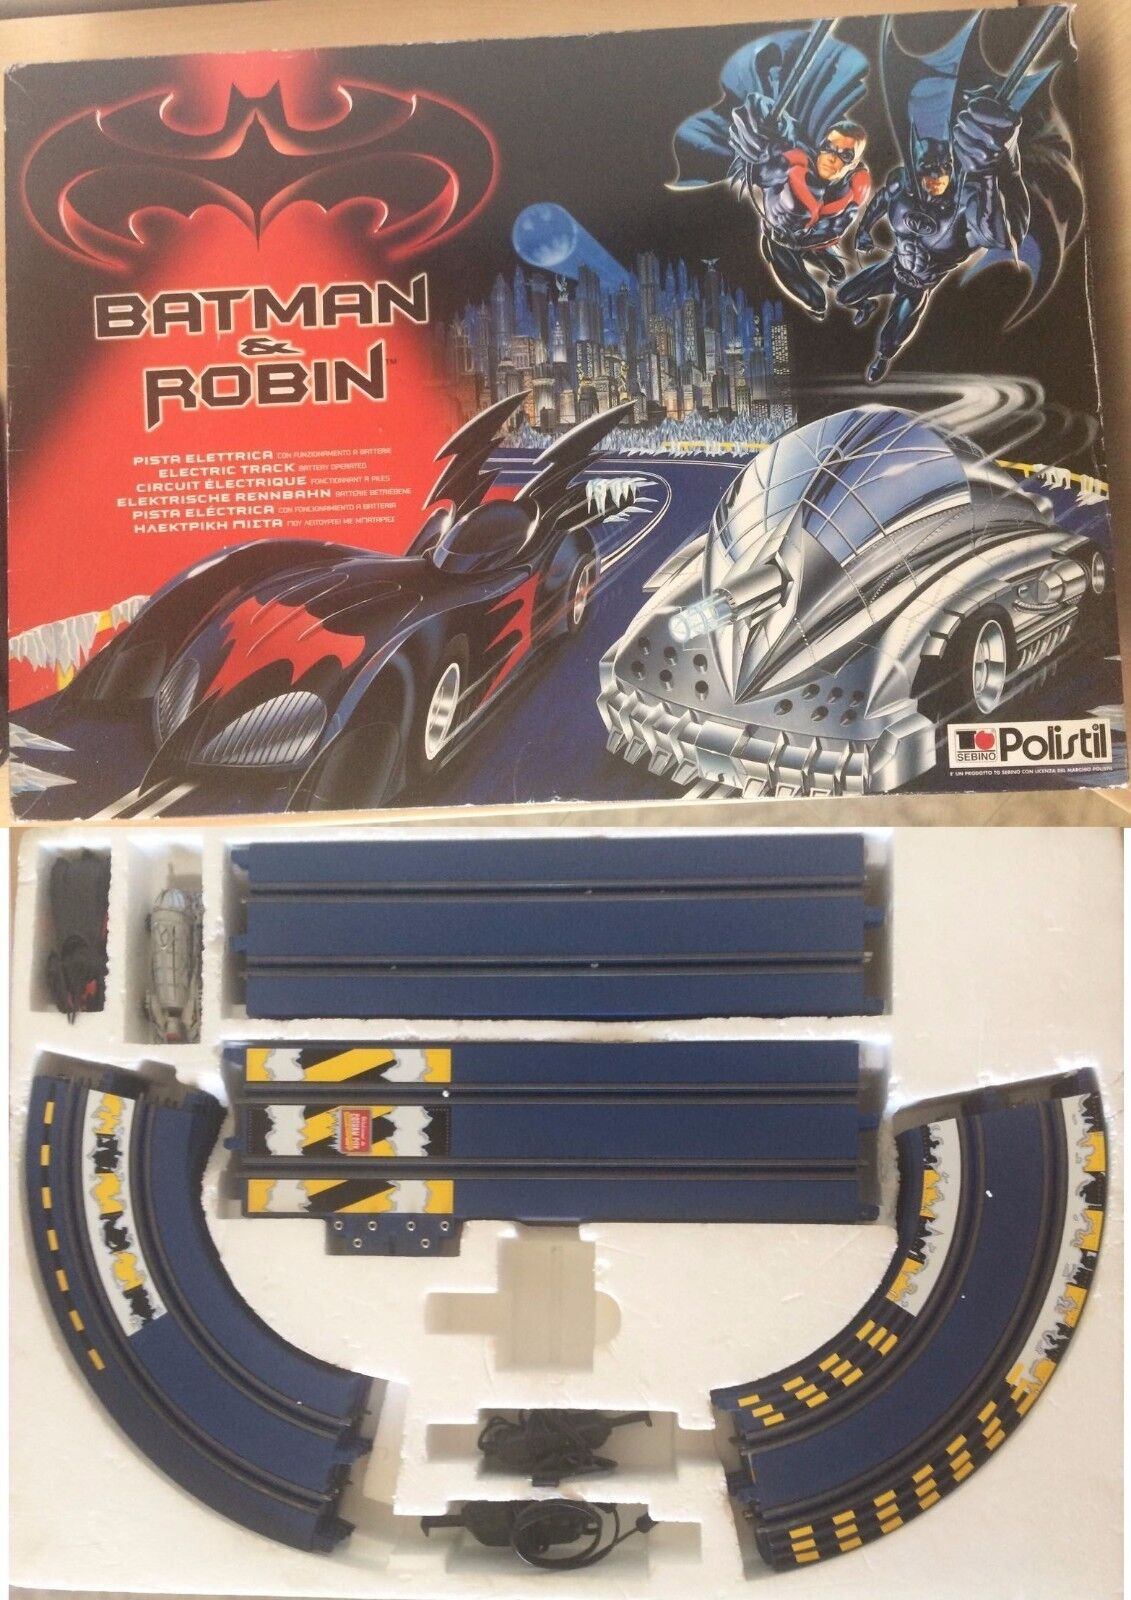 Batman & Robin pista Polistil